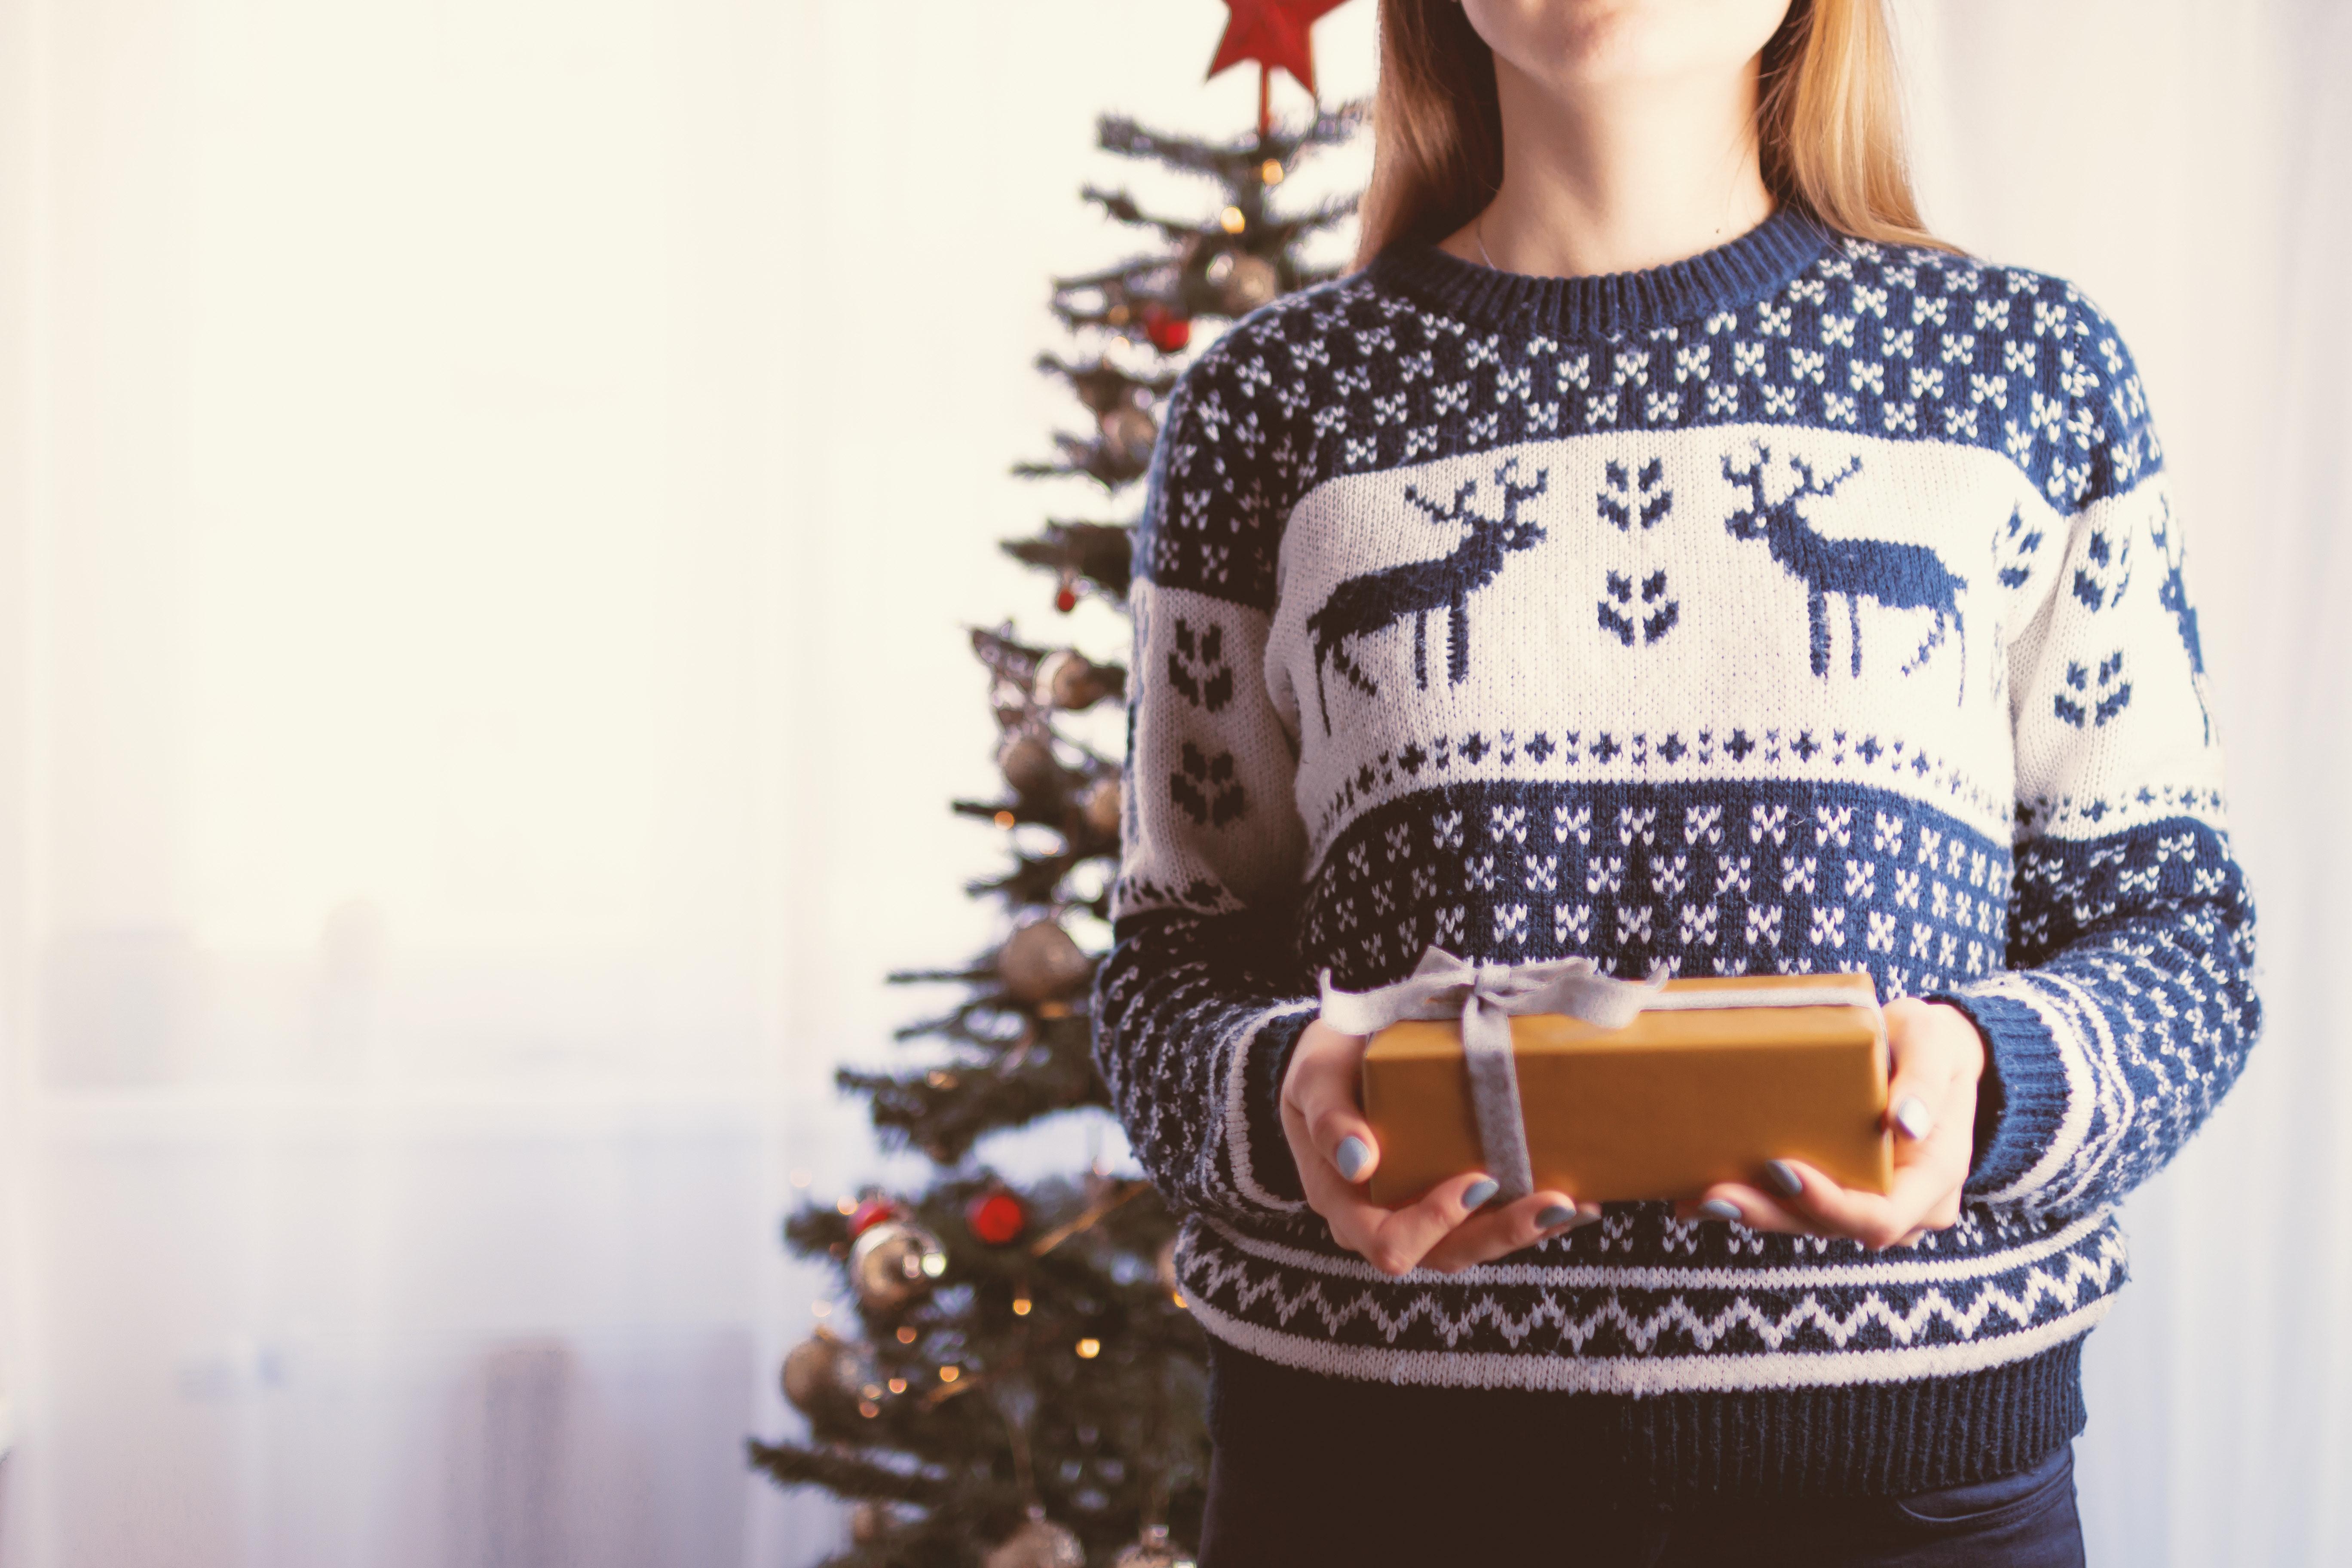 Christmas-themed Wallpaper, Box, Person, Woman, White, HQ Photo